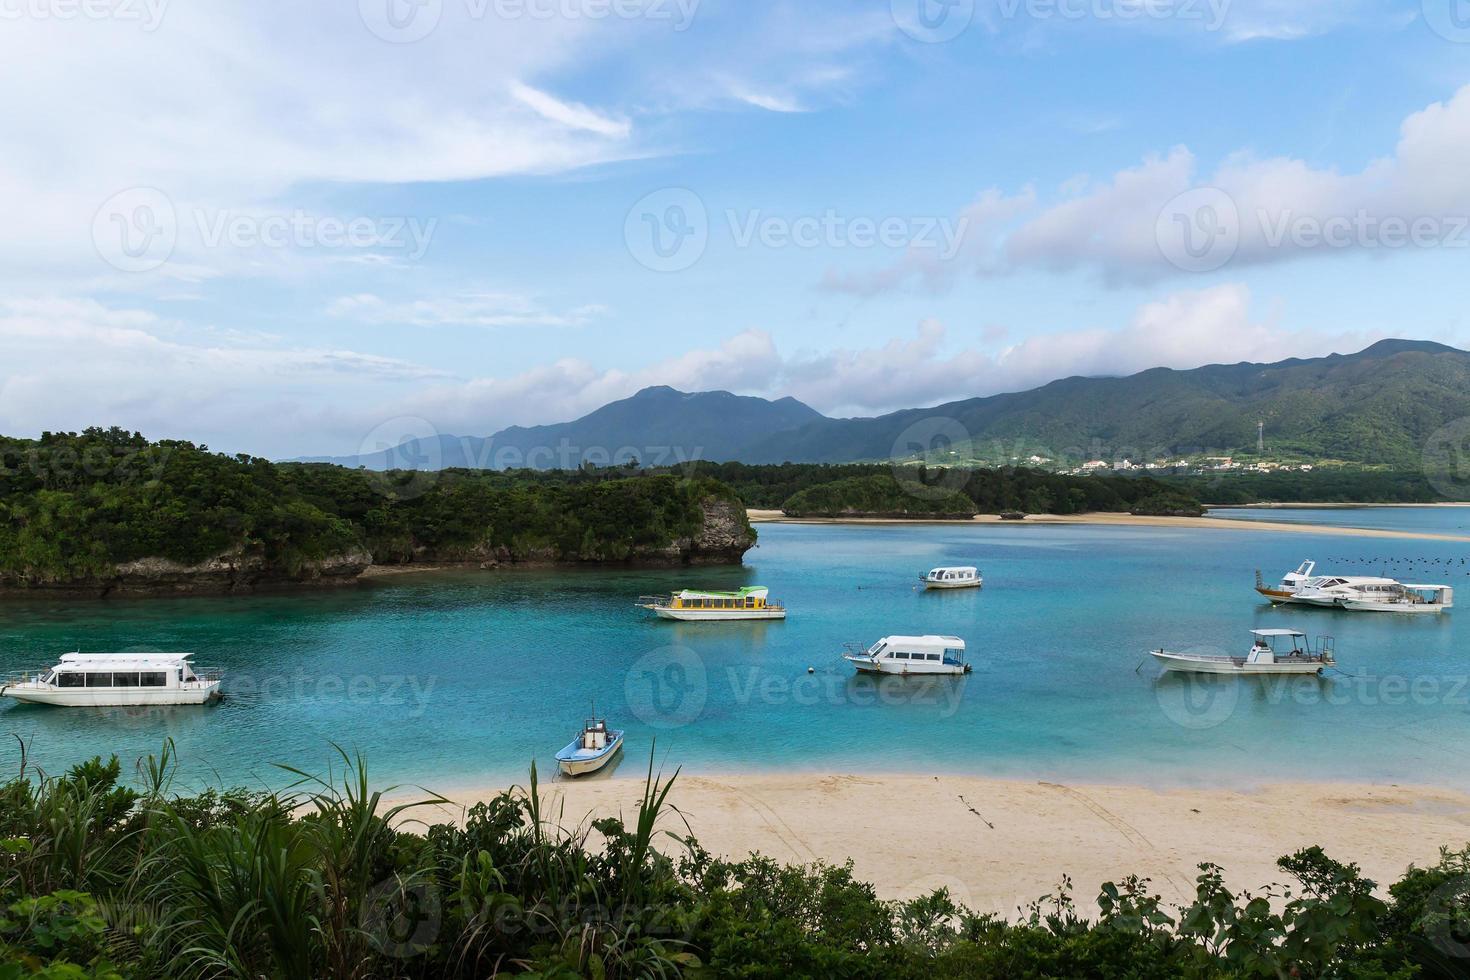 Kabira Bay in Ishigaki Island, Okinawa Japan photo